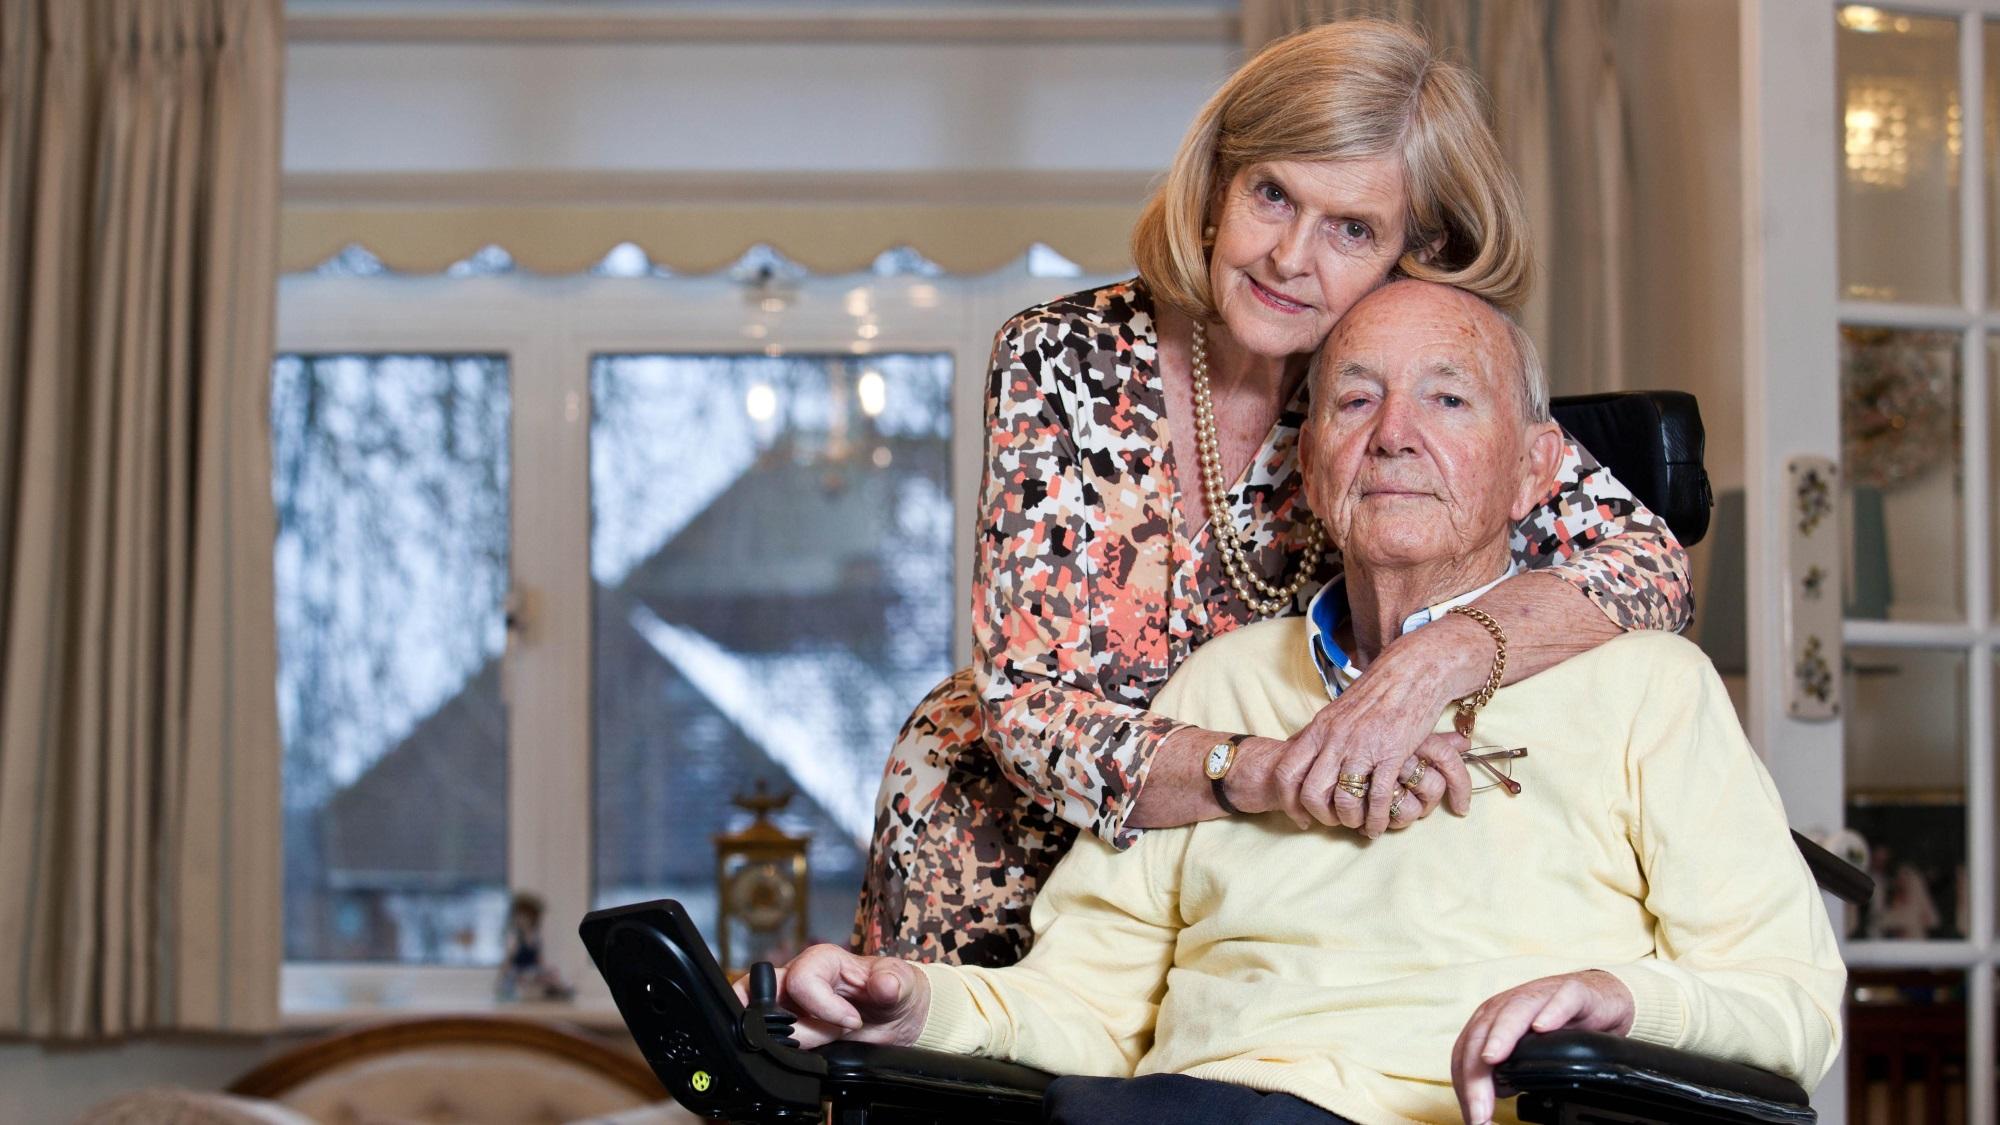 Geoff and Ann Whaley